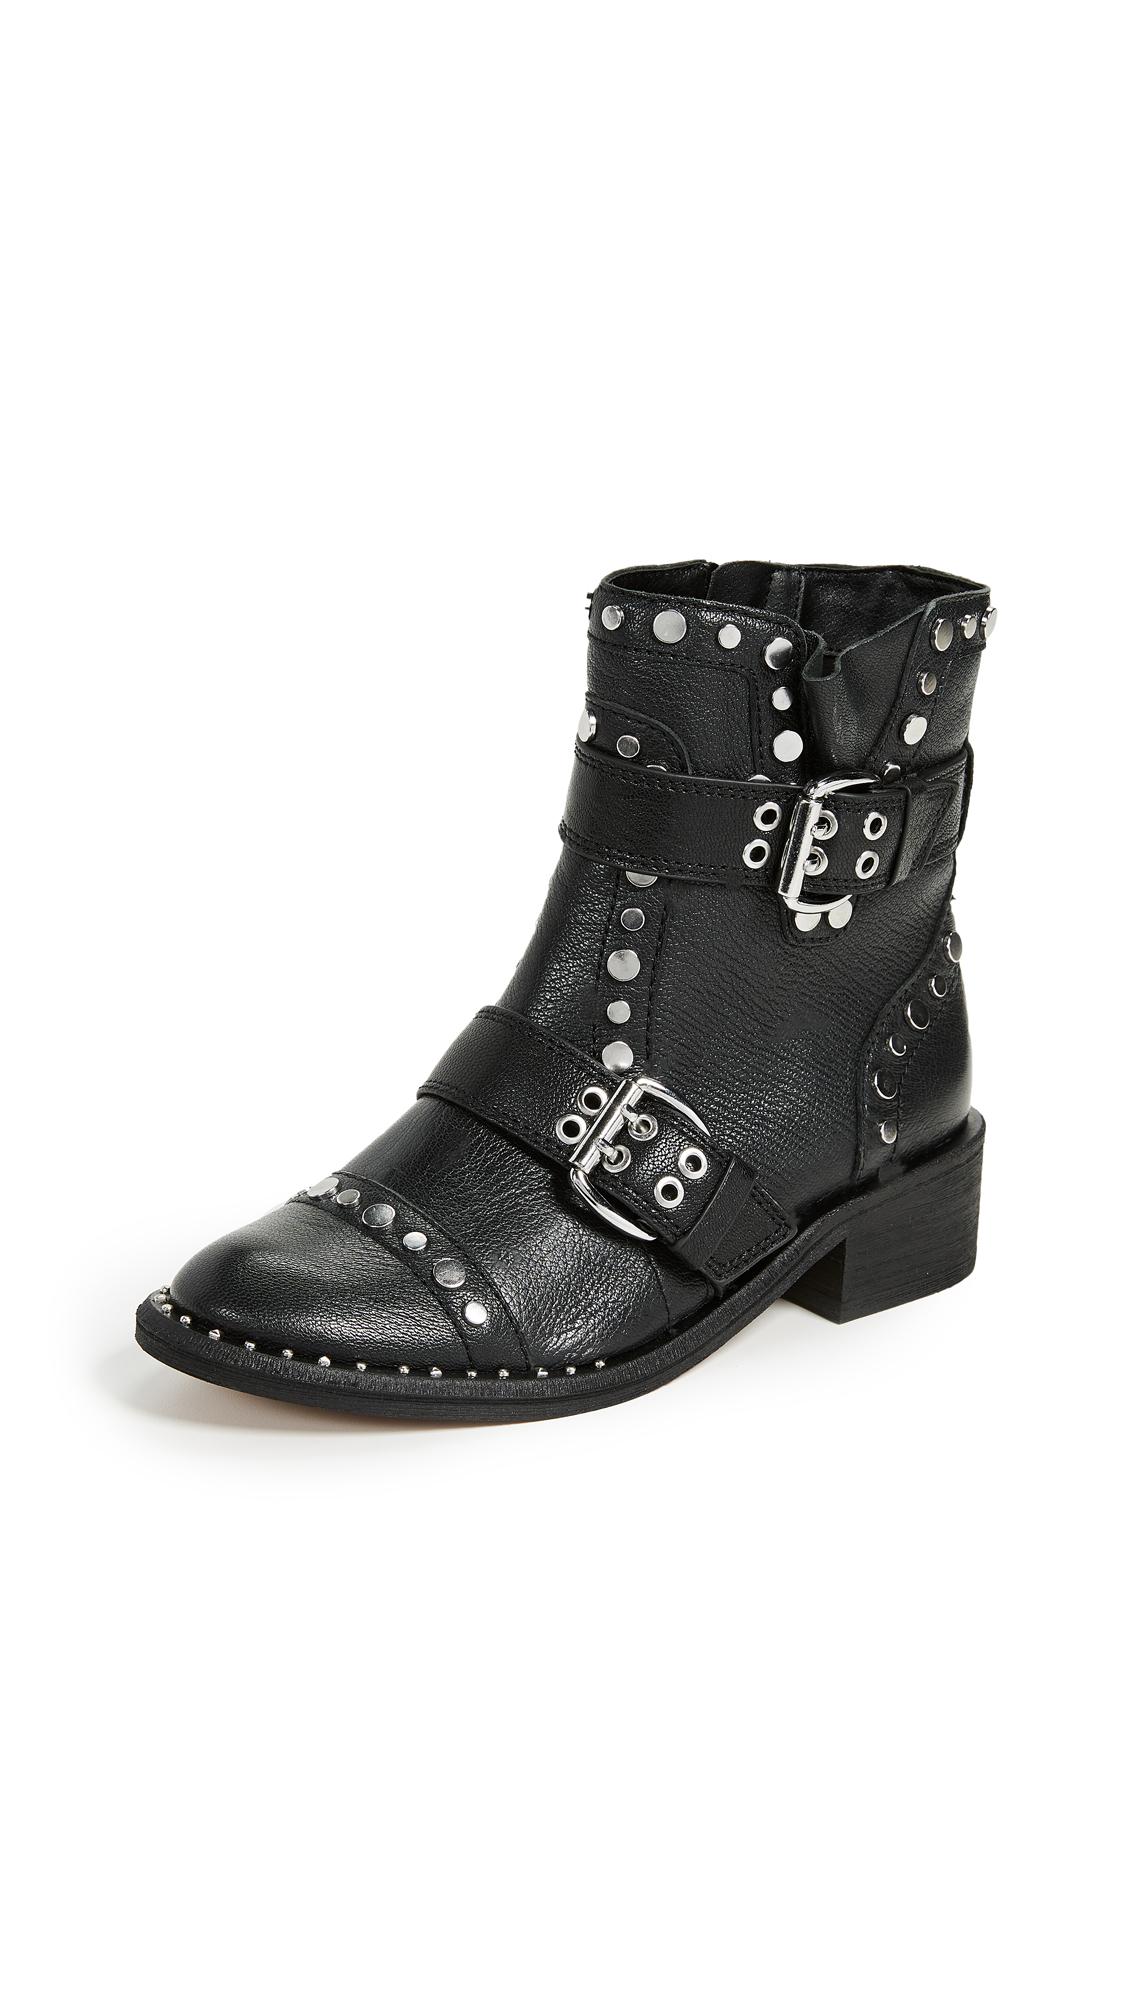 Sam Edelman Drea Boots - Black